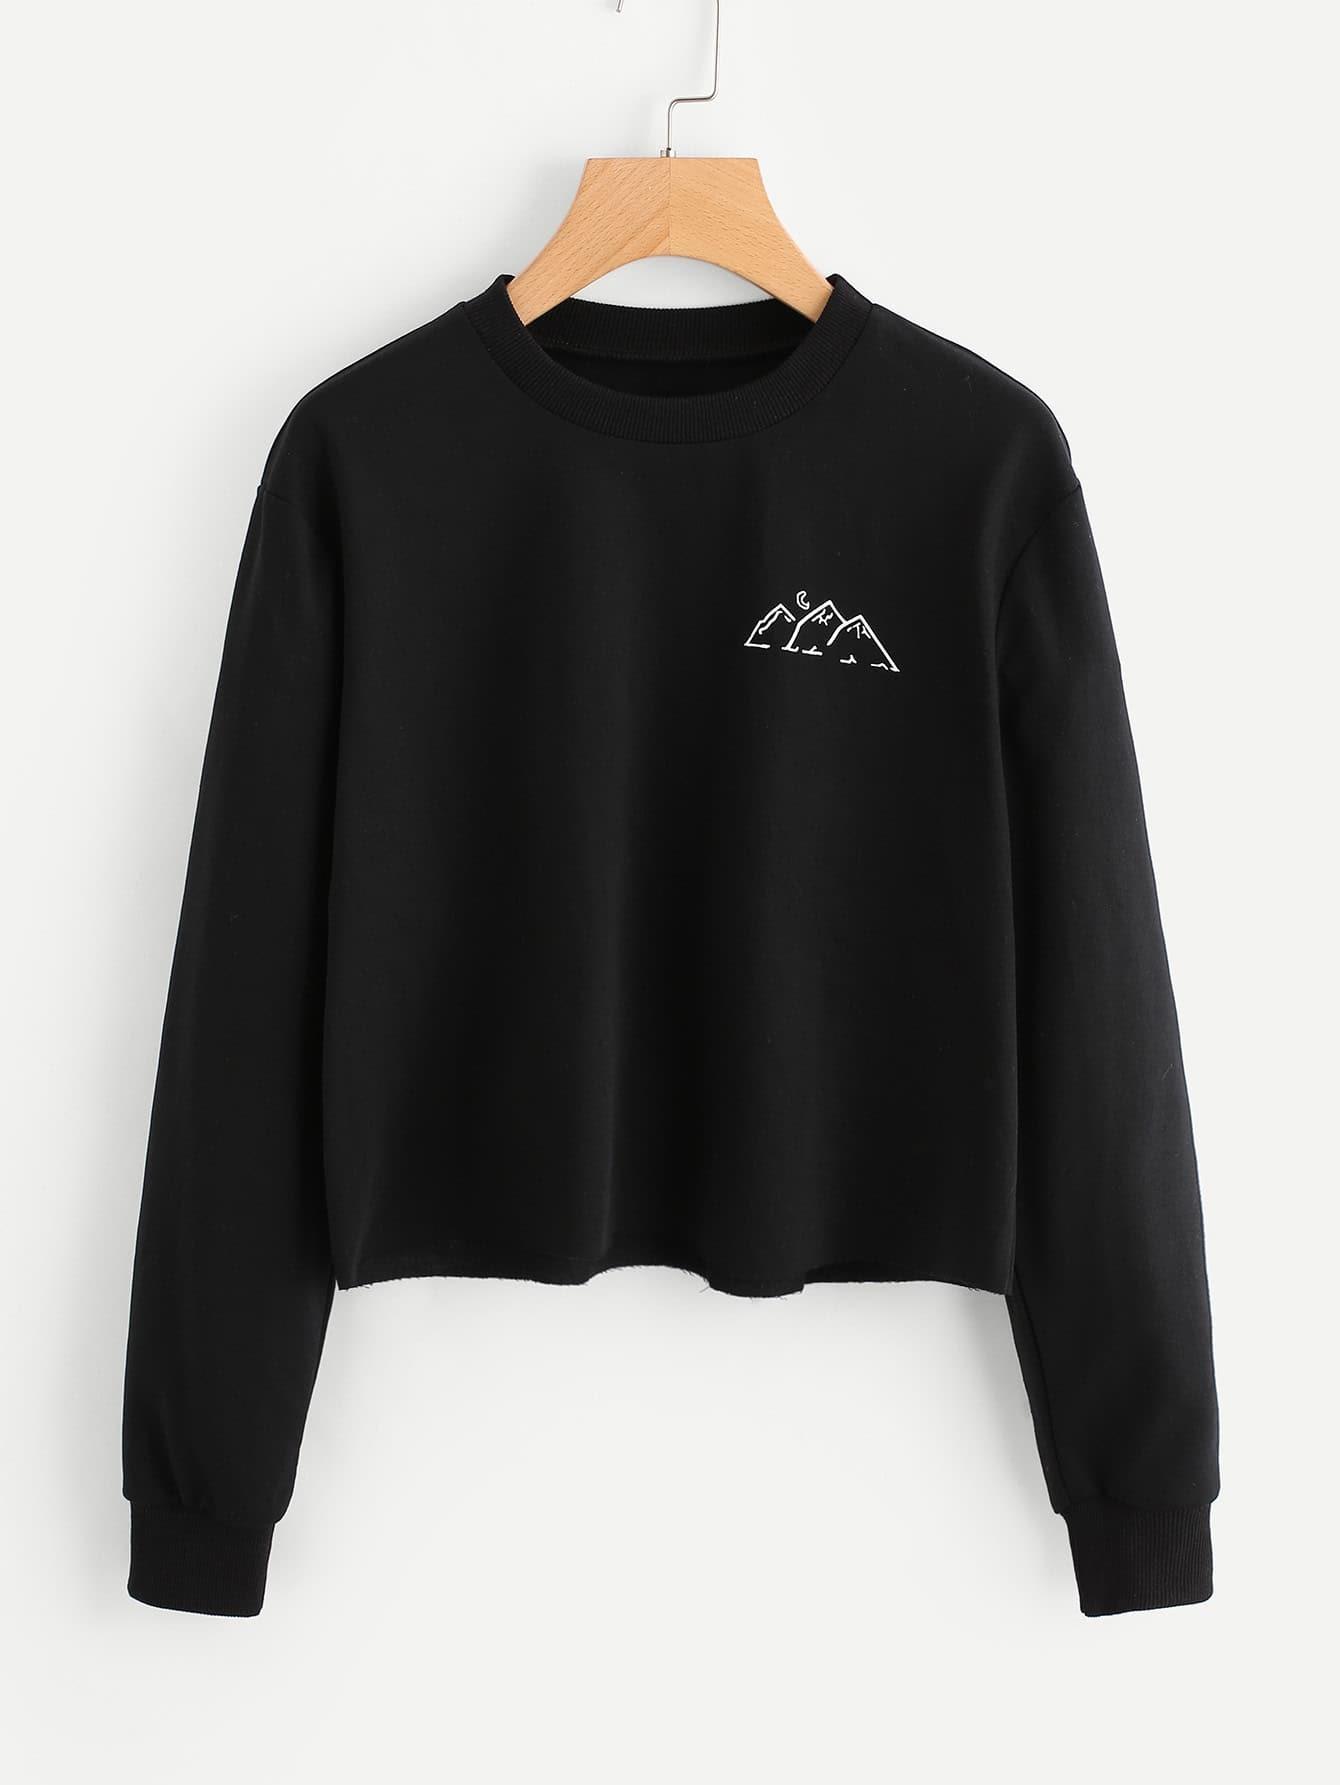 Raw Hem Graphic Print Sweatshirt faux fur cuff drop shoulder raw hem sweatshirt